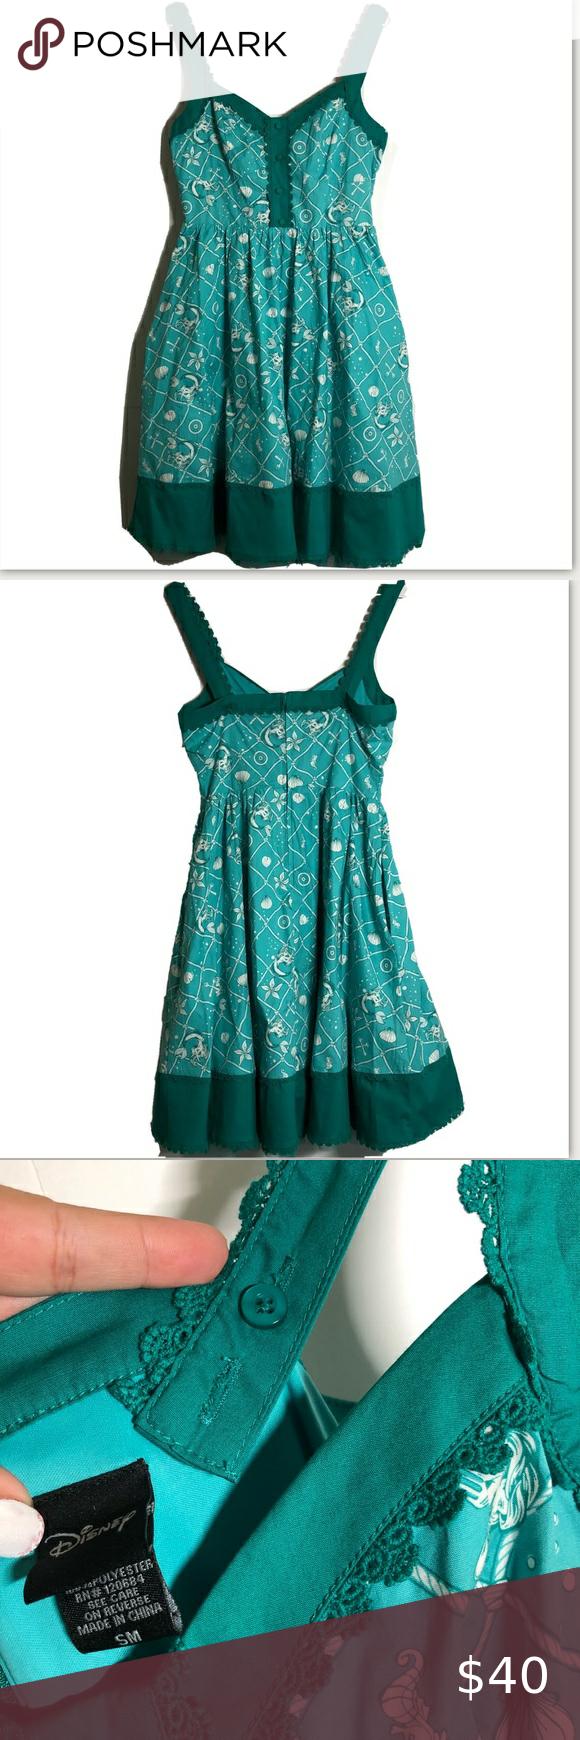 Disney Little Mermaid inspired princess dress Disney Little Mermaid inspired pri…